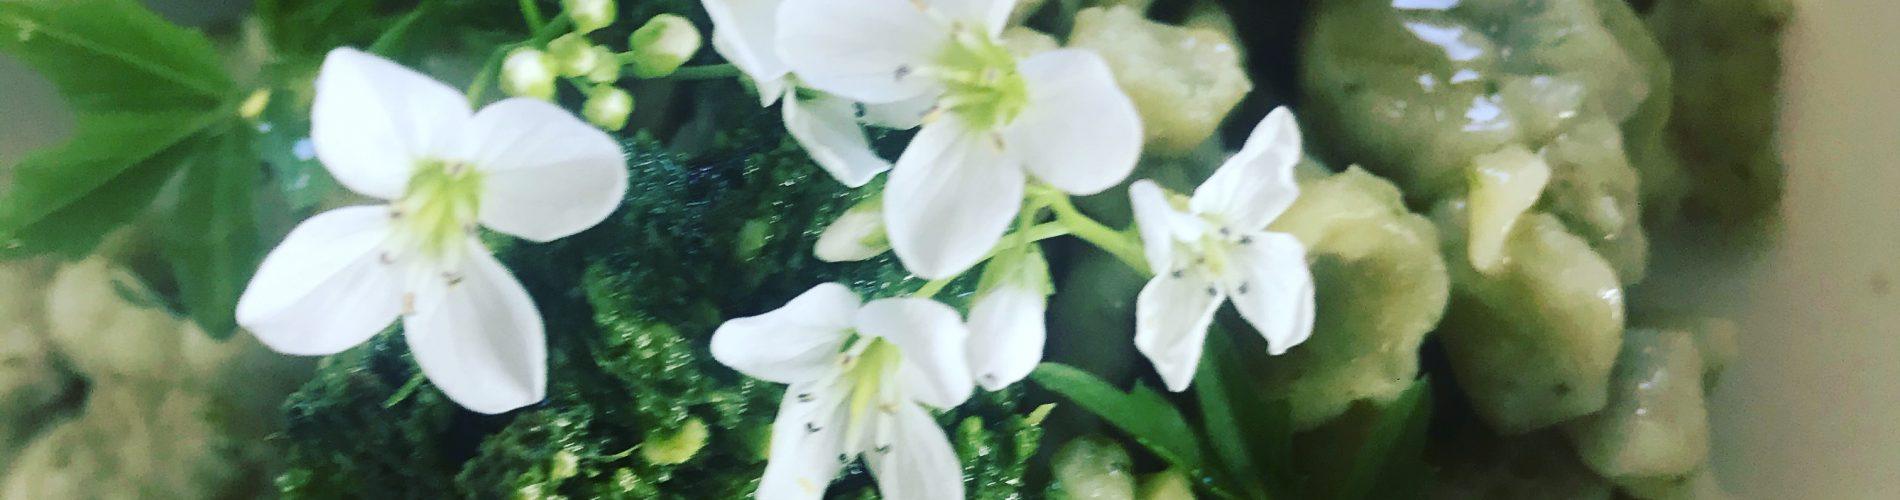 wild garlic and nettle nockerl